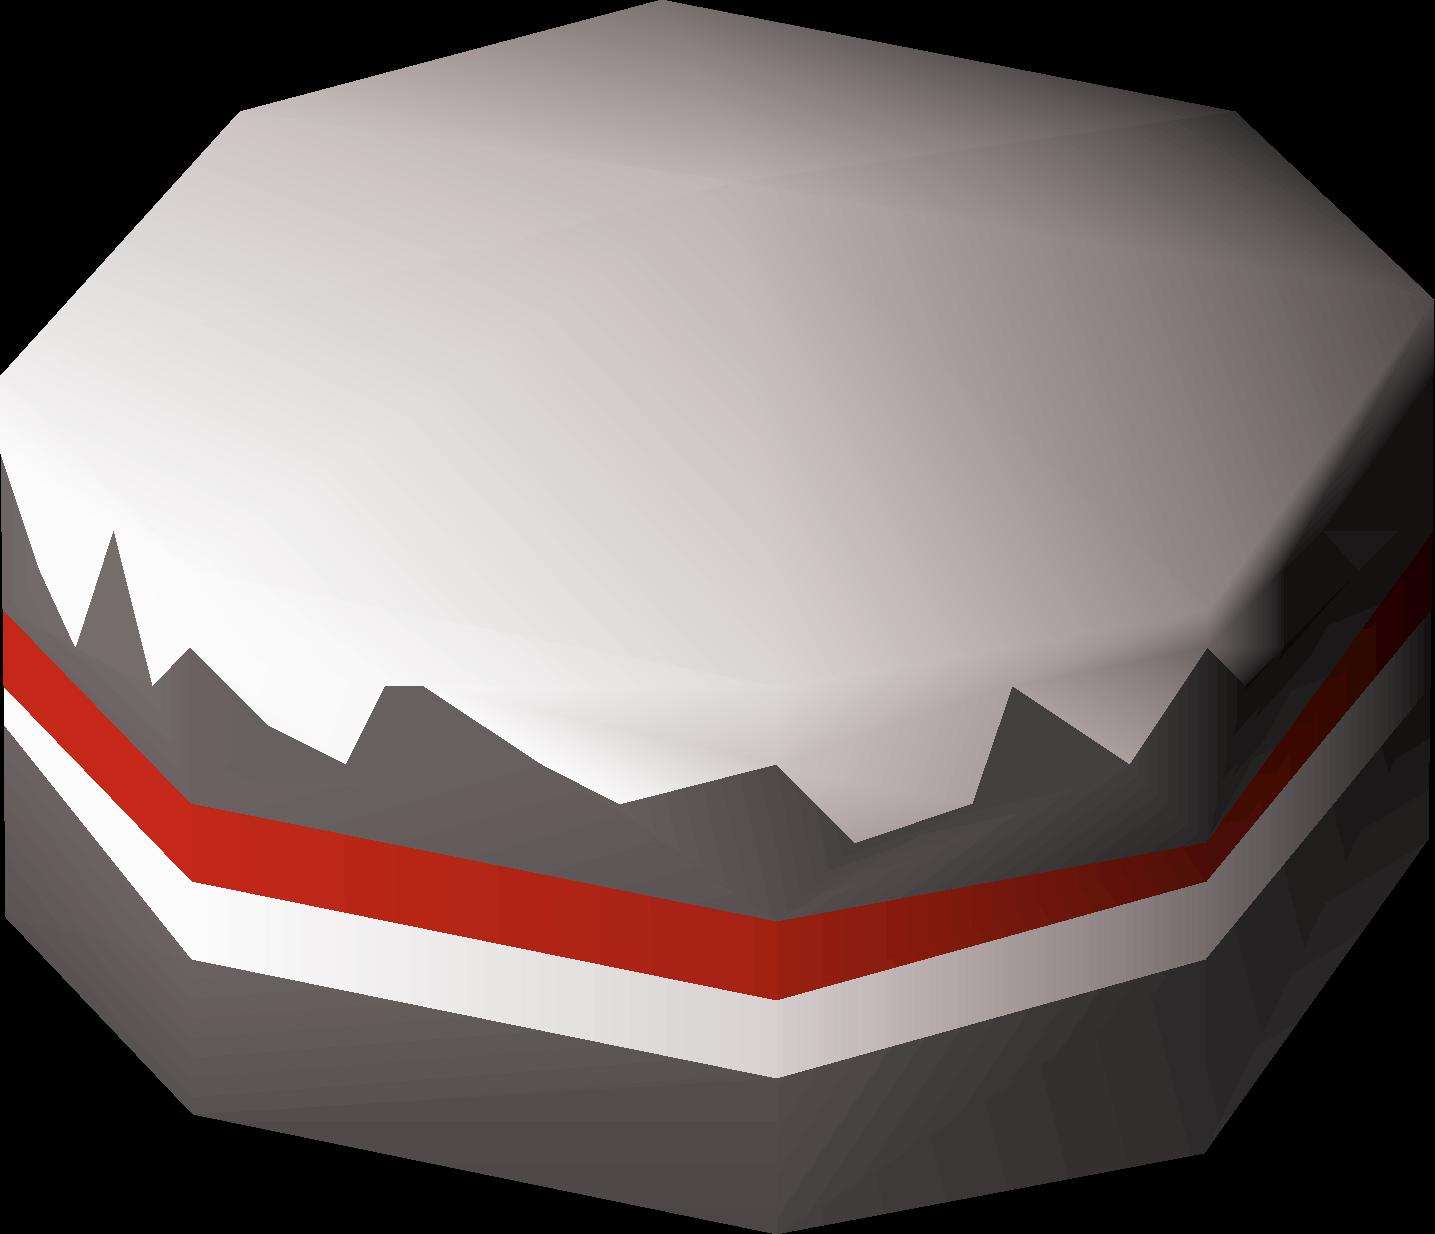 Burnt cake - OSRS Wiki